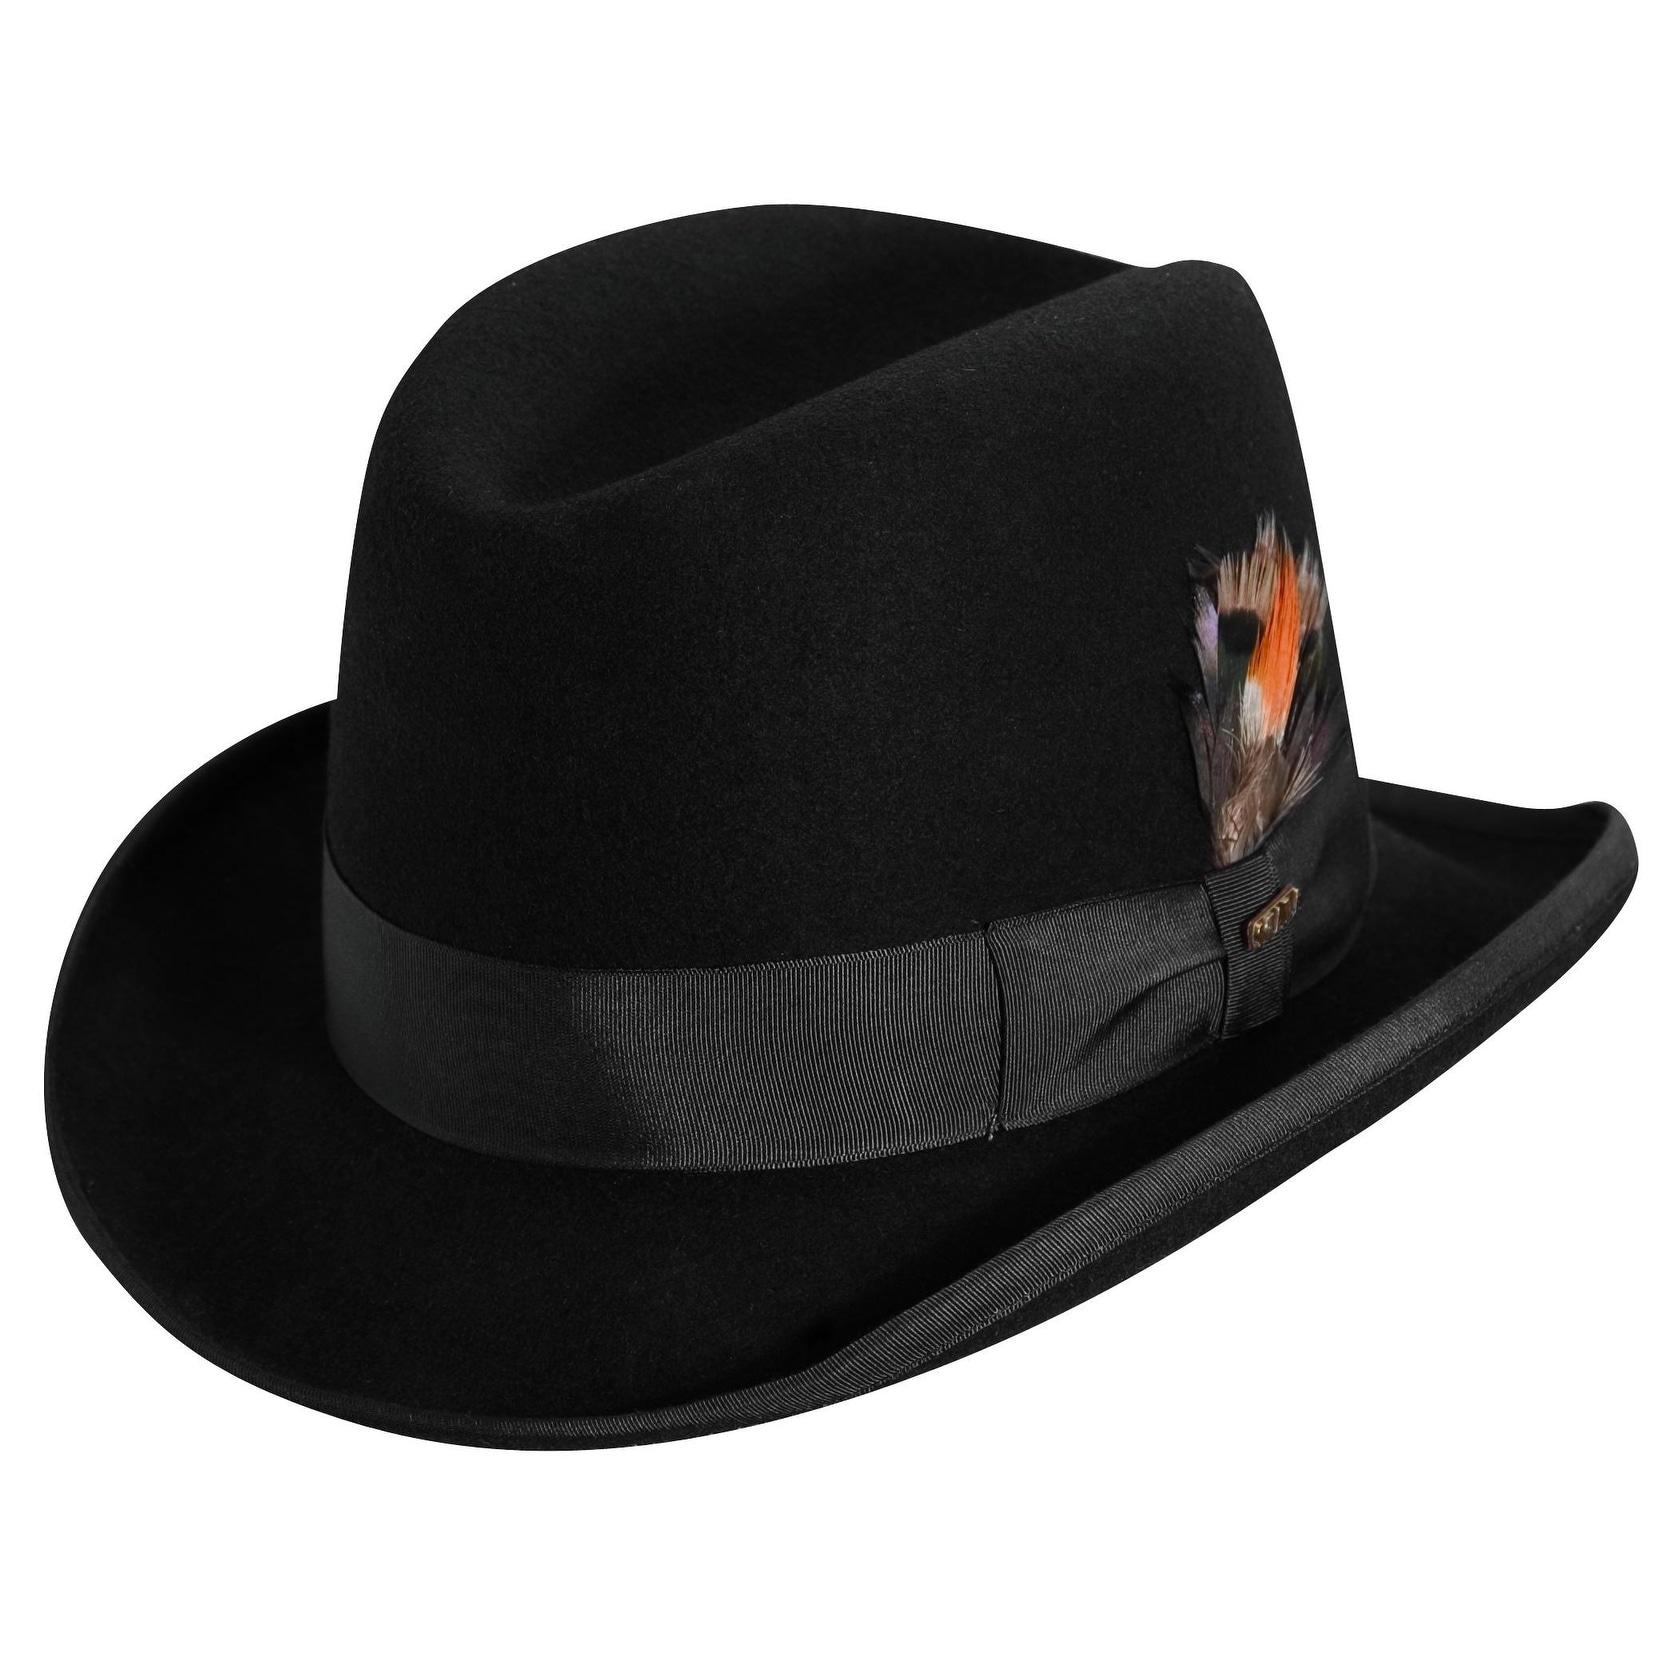 40d039b3d23 Shop Scala Men s Wool Felt Winter Homburg Hat - Free Shipping On Orders  Over  45 - Overstock - 14279038